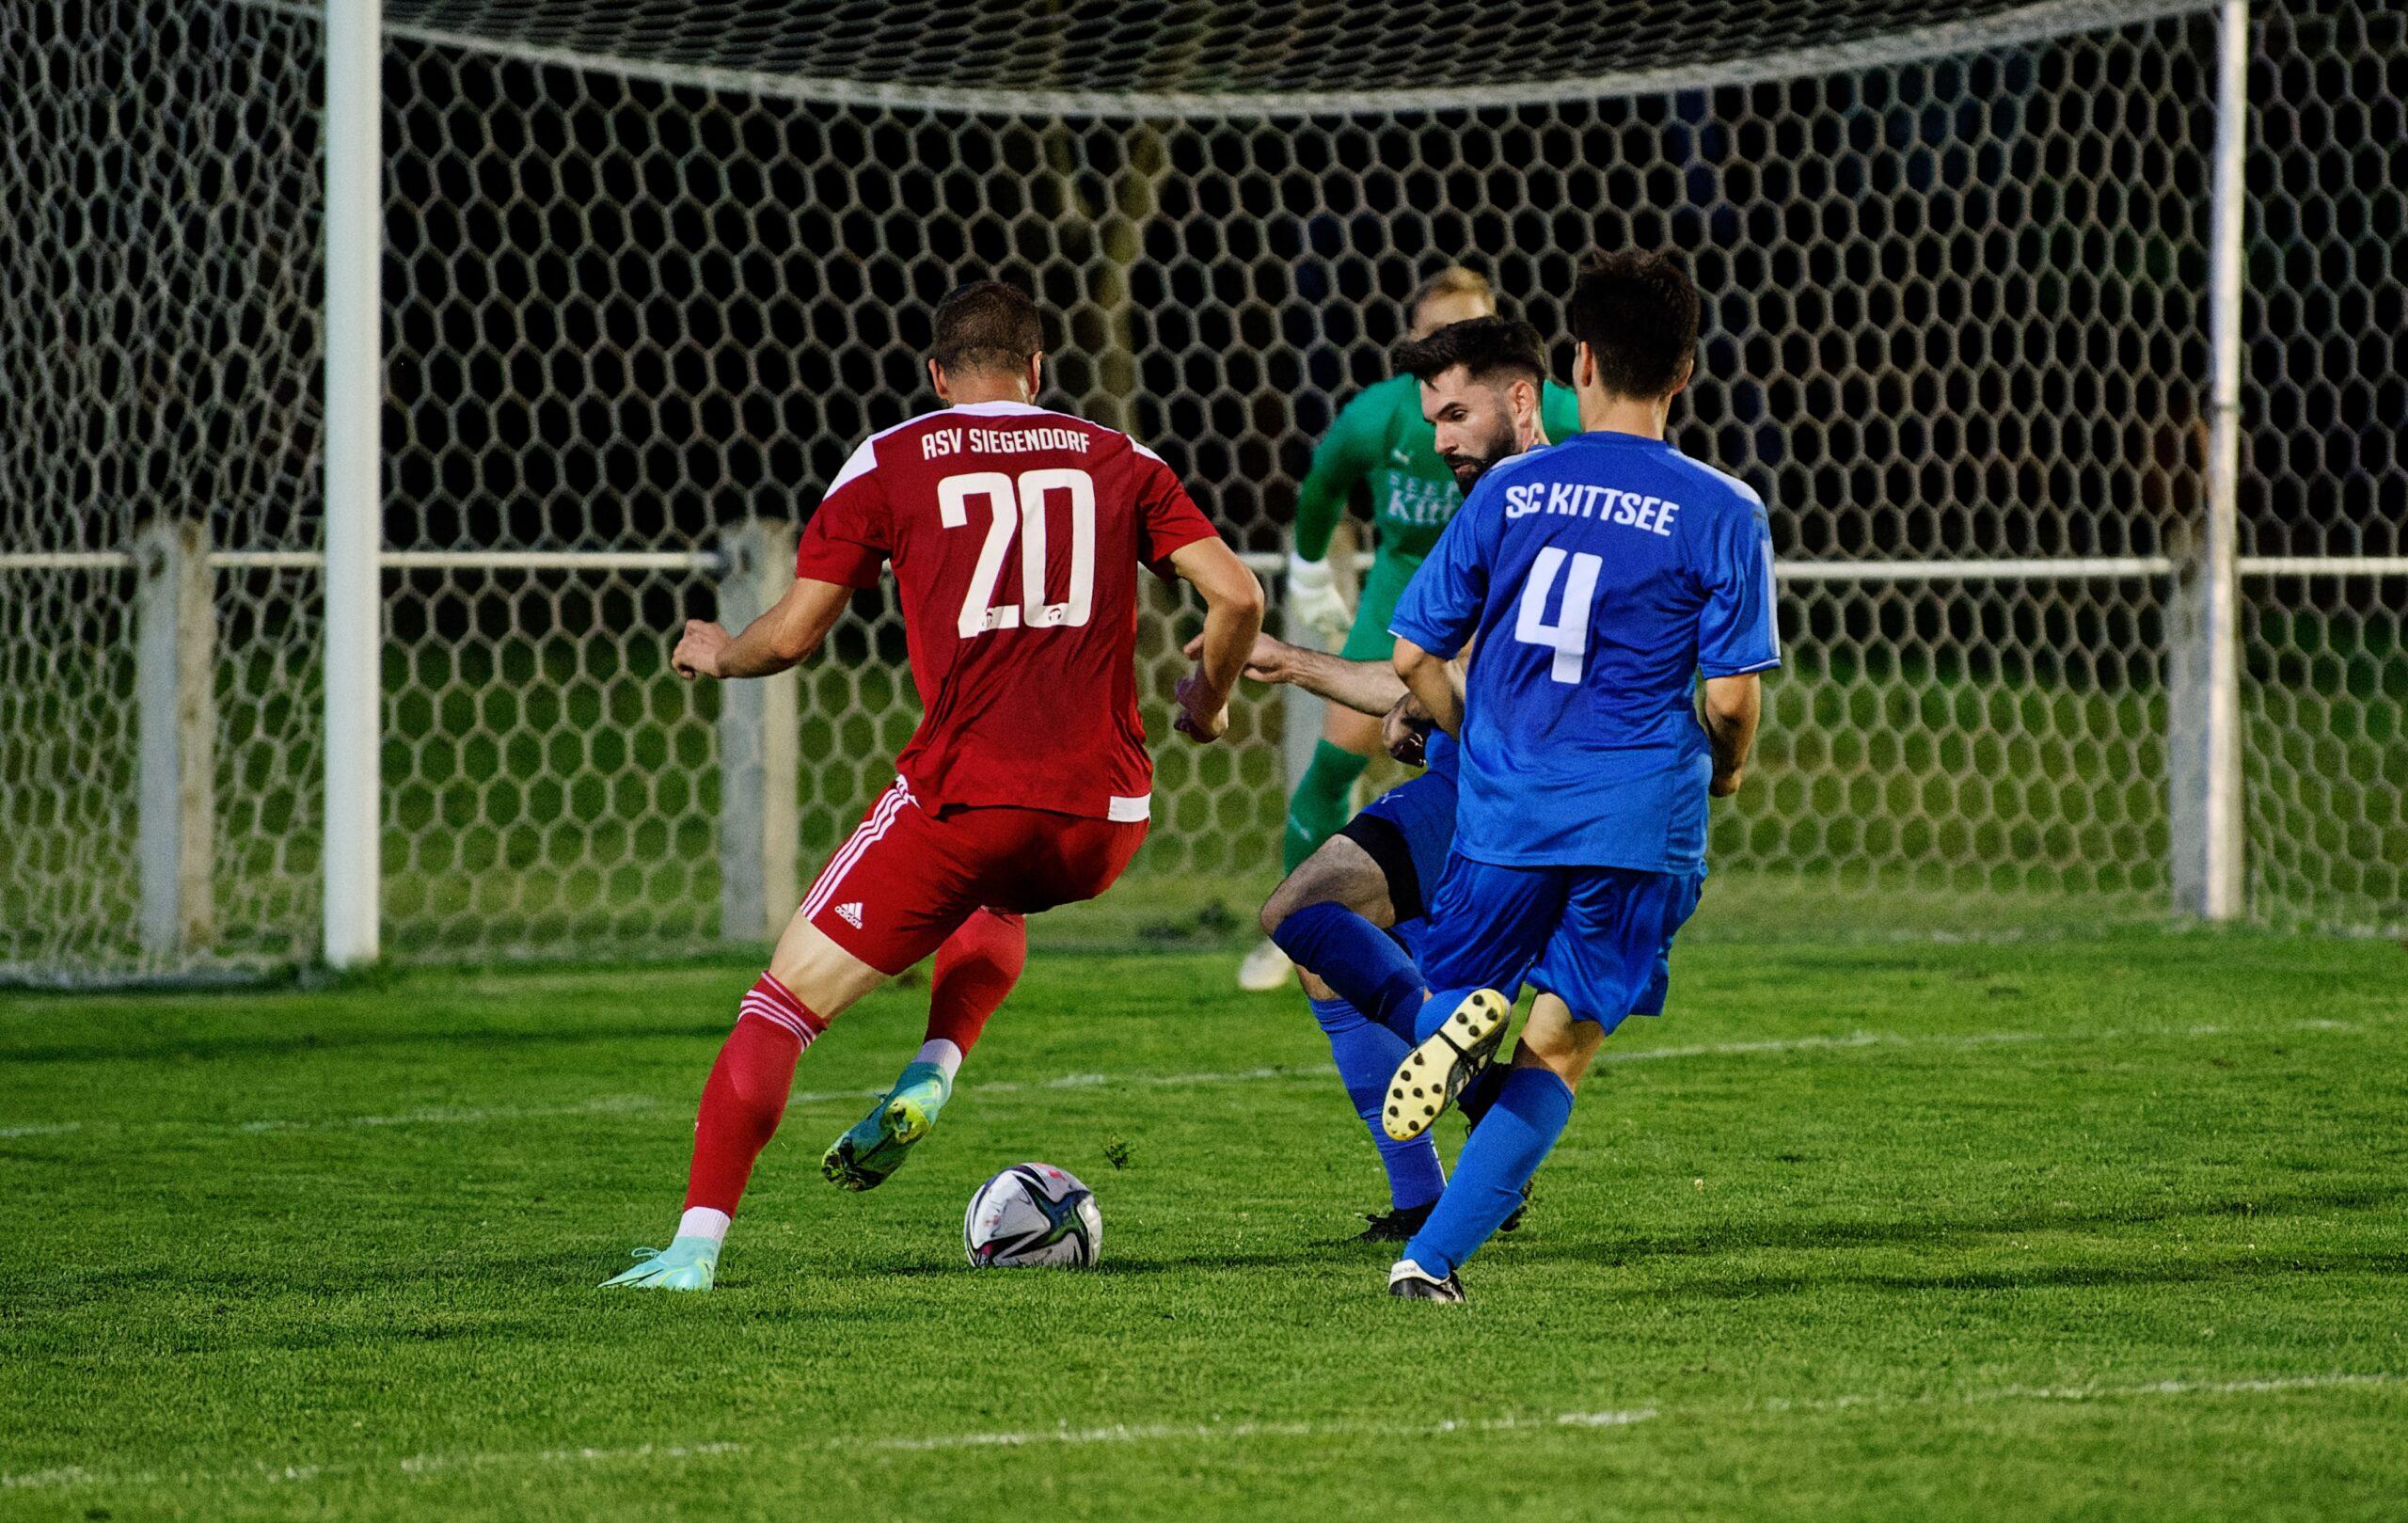 Juraj Fuska defends Kovacec